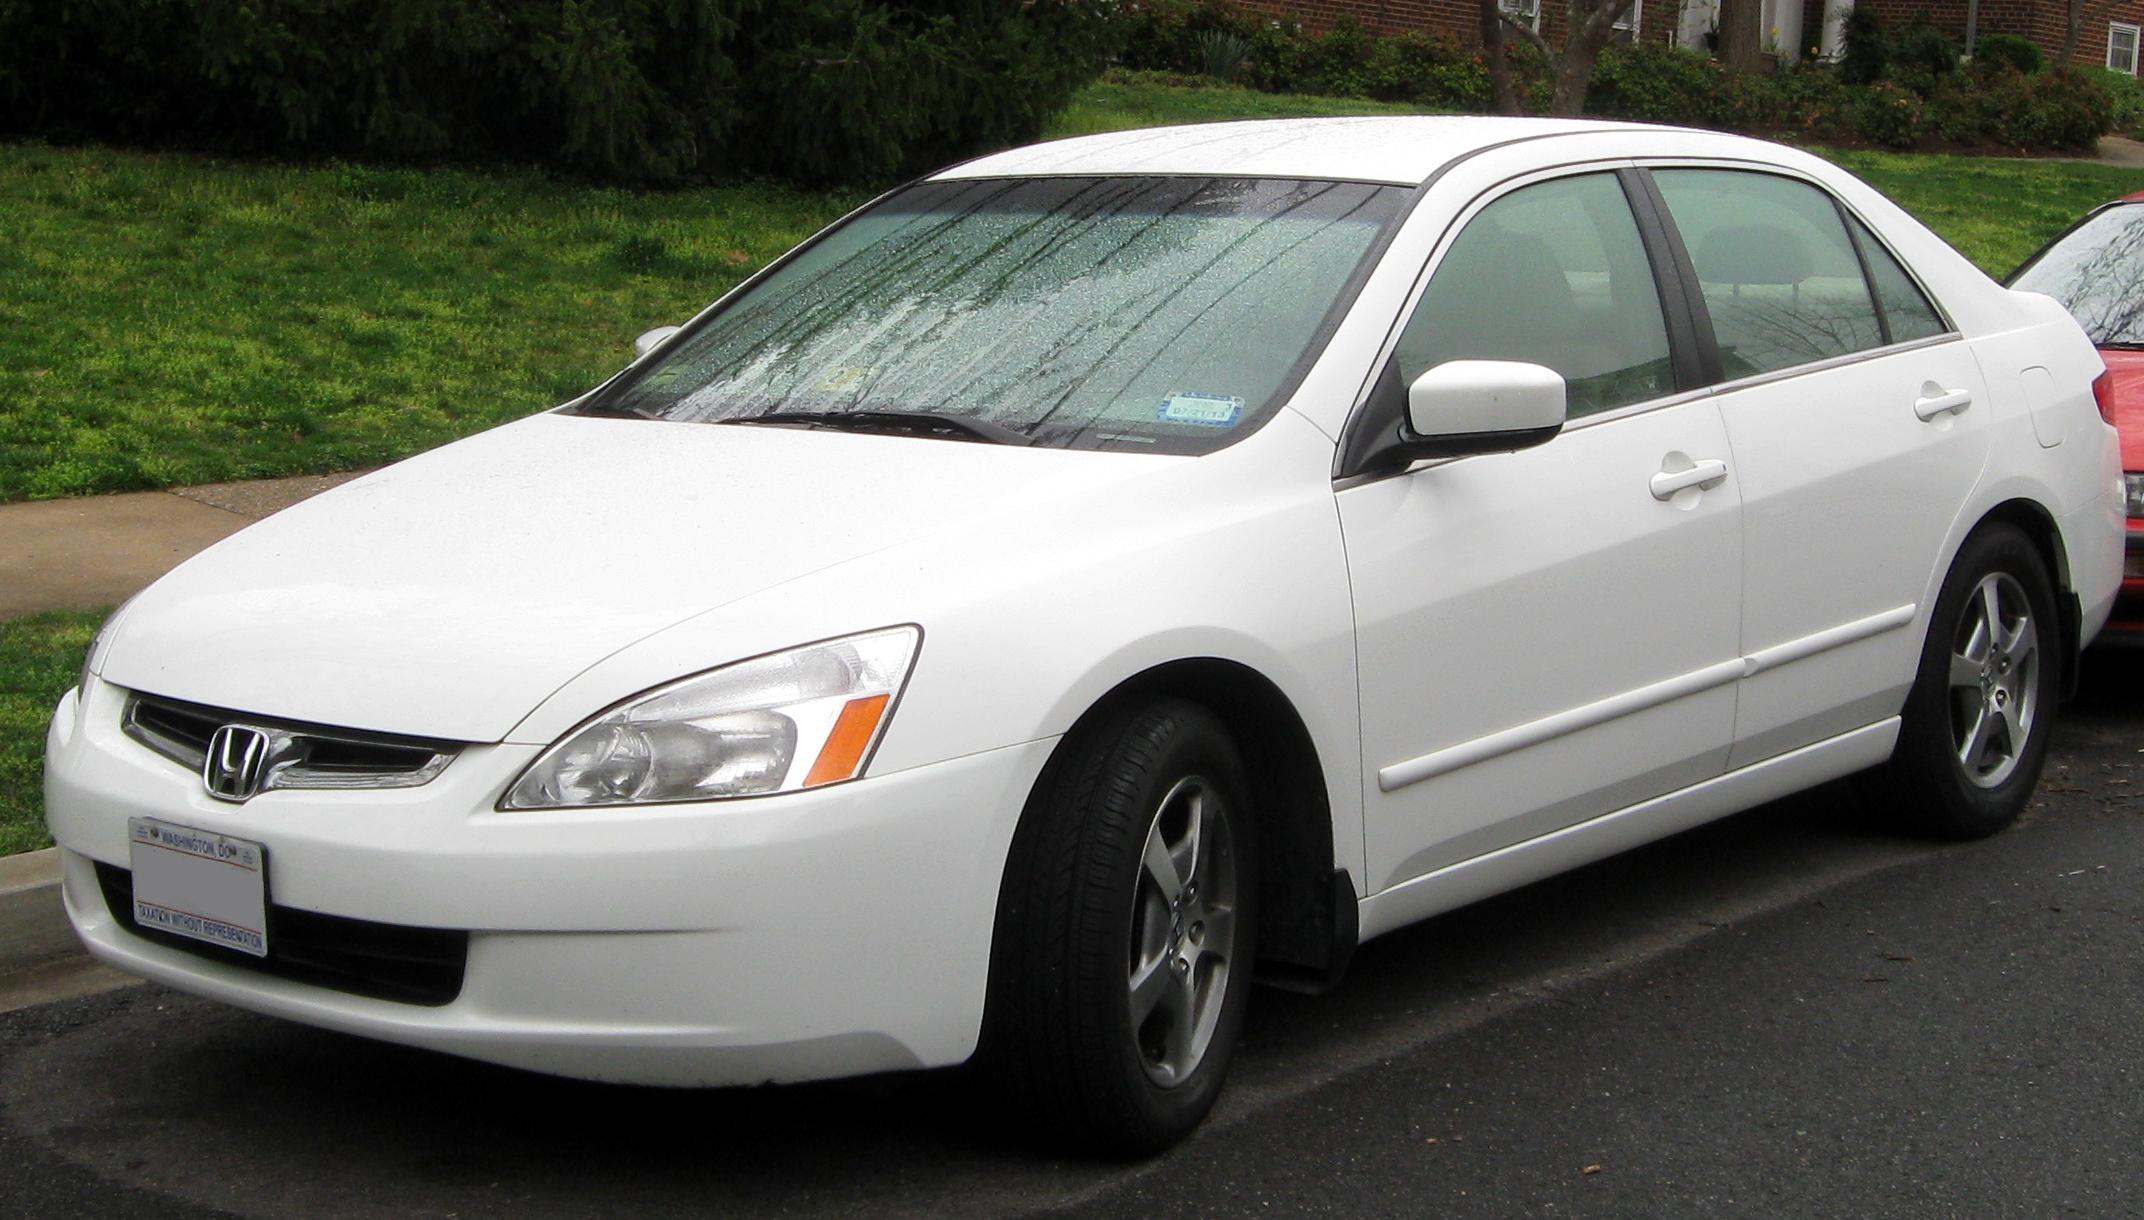 Awesome File:2005 Honda Accord Hybrid    03 21 2012 2.JPG